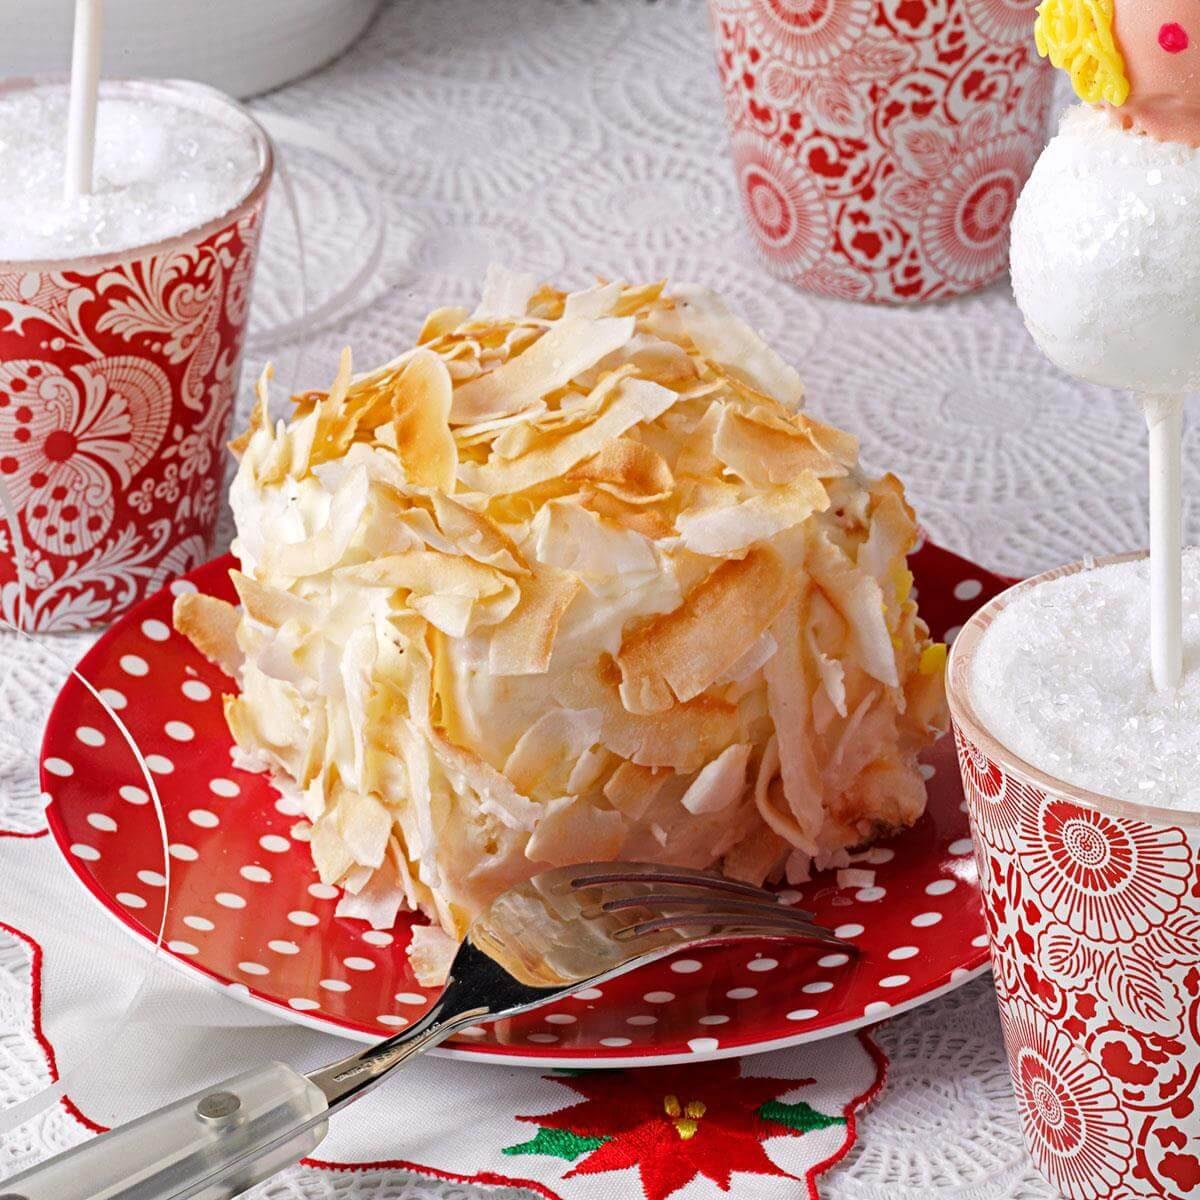 Pineapple Cake Mix Recipes: Petite Pineapple Coconut Cakes Recipe